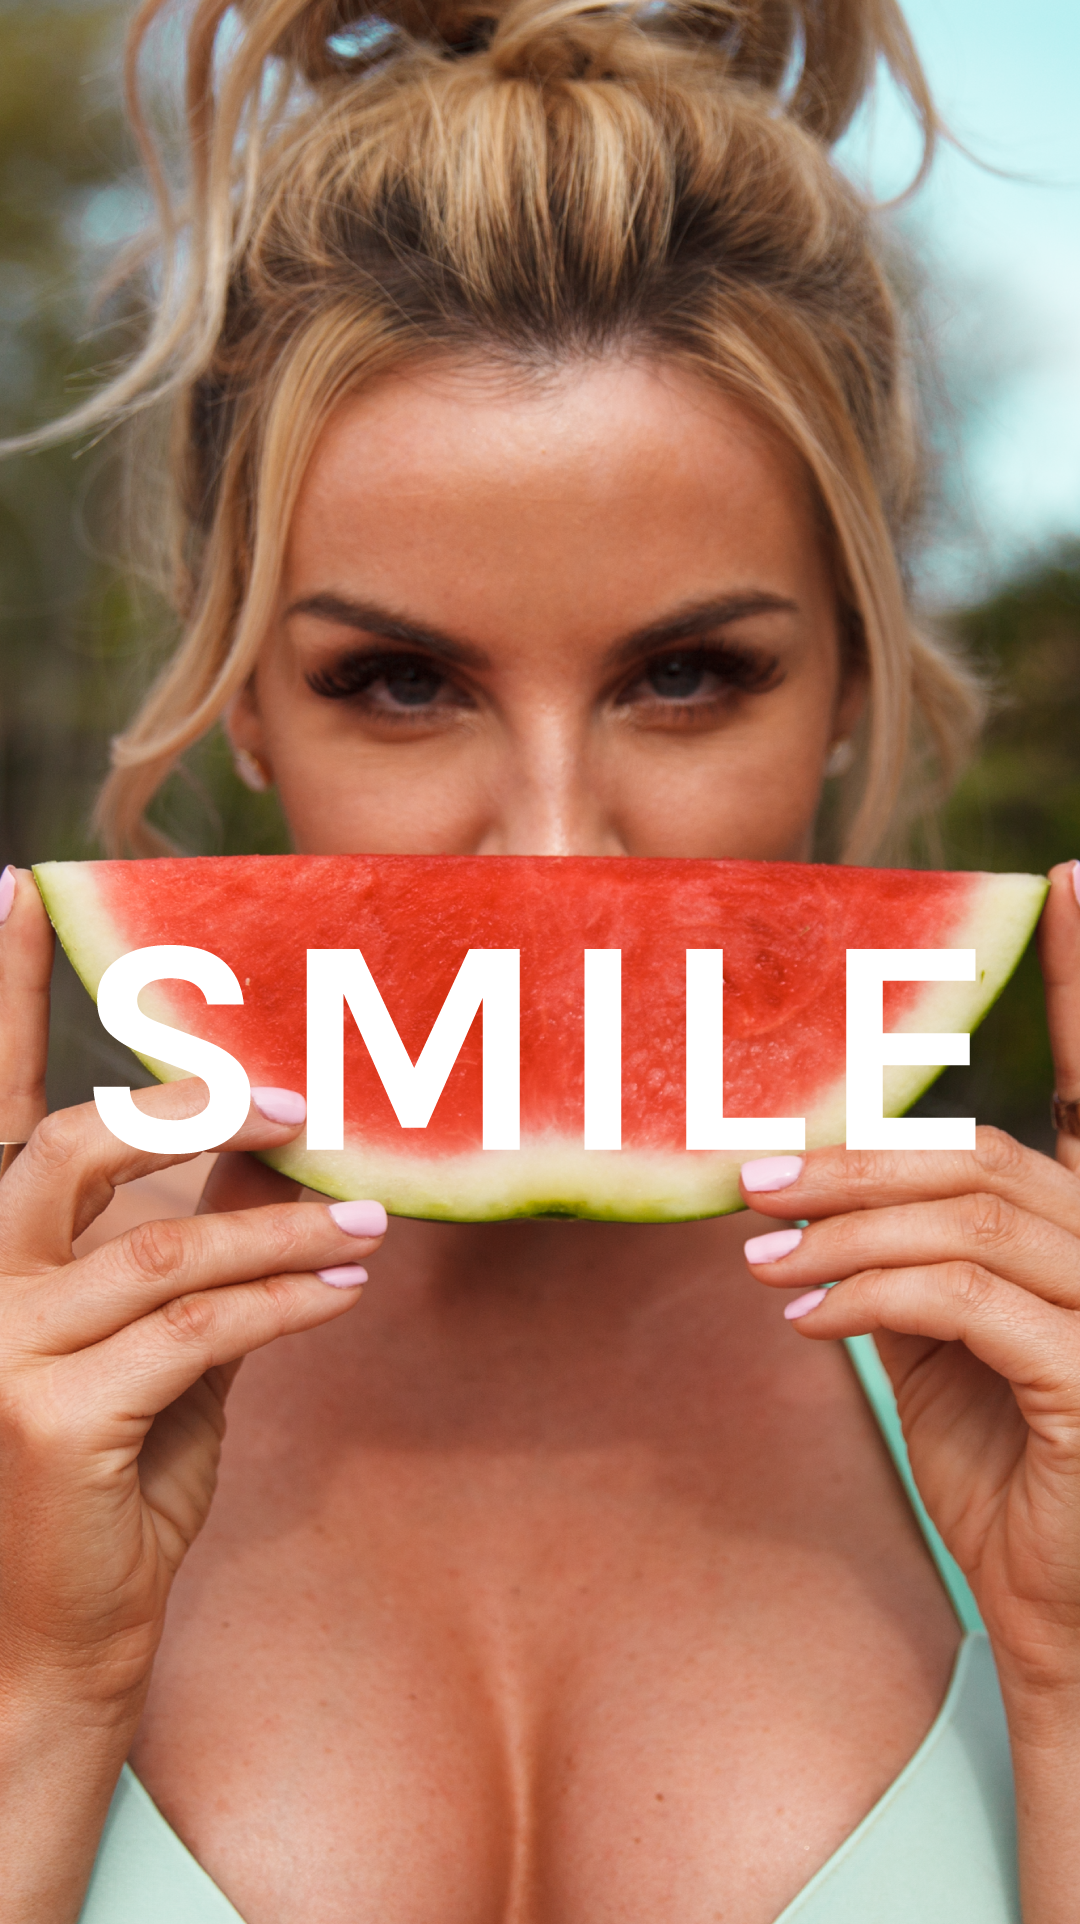 Smile_2b.png